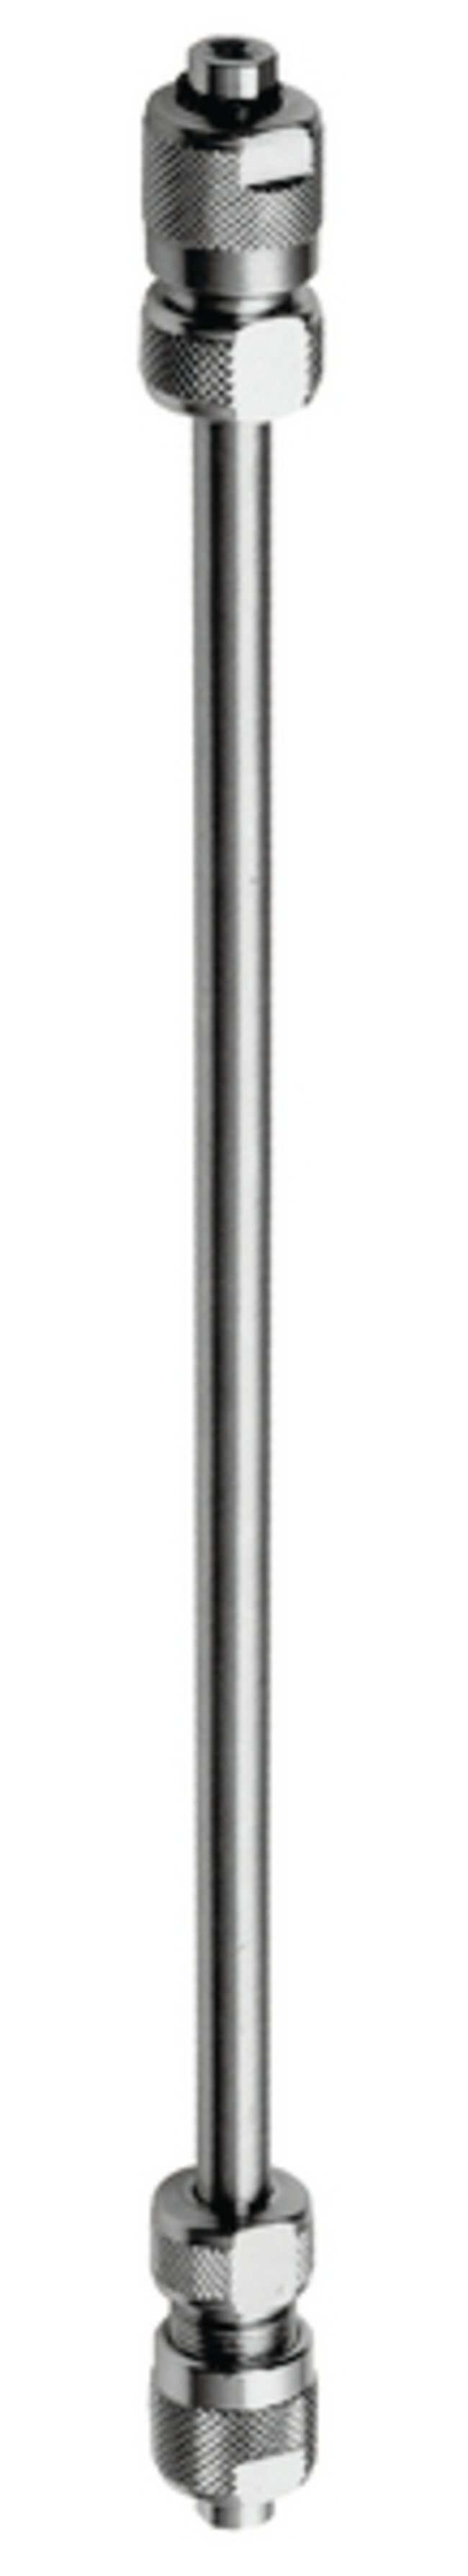 MilliporeSigma™LiChroCART™ Column/LiChrospher™ 100 RP-18 Endcapped Sorbent HPLC Cartridges, 5μm